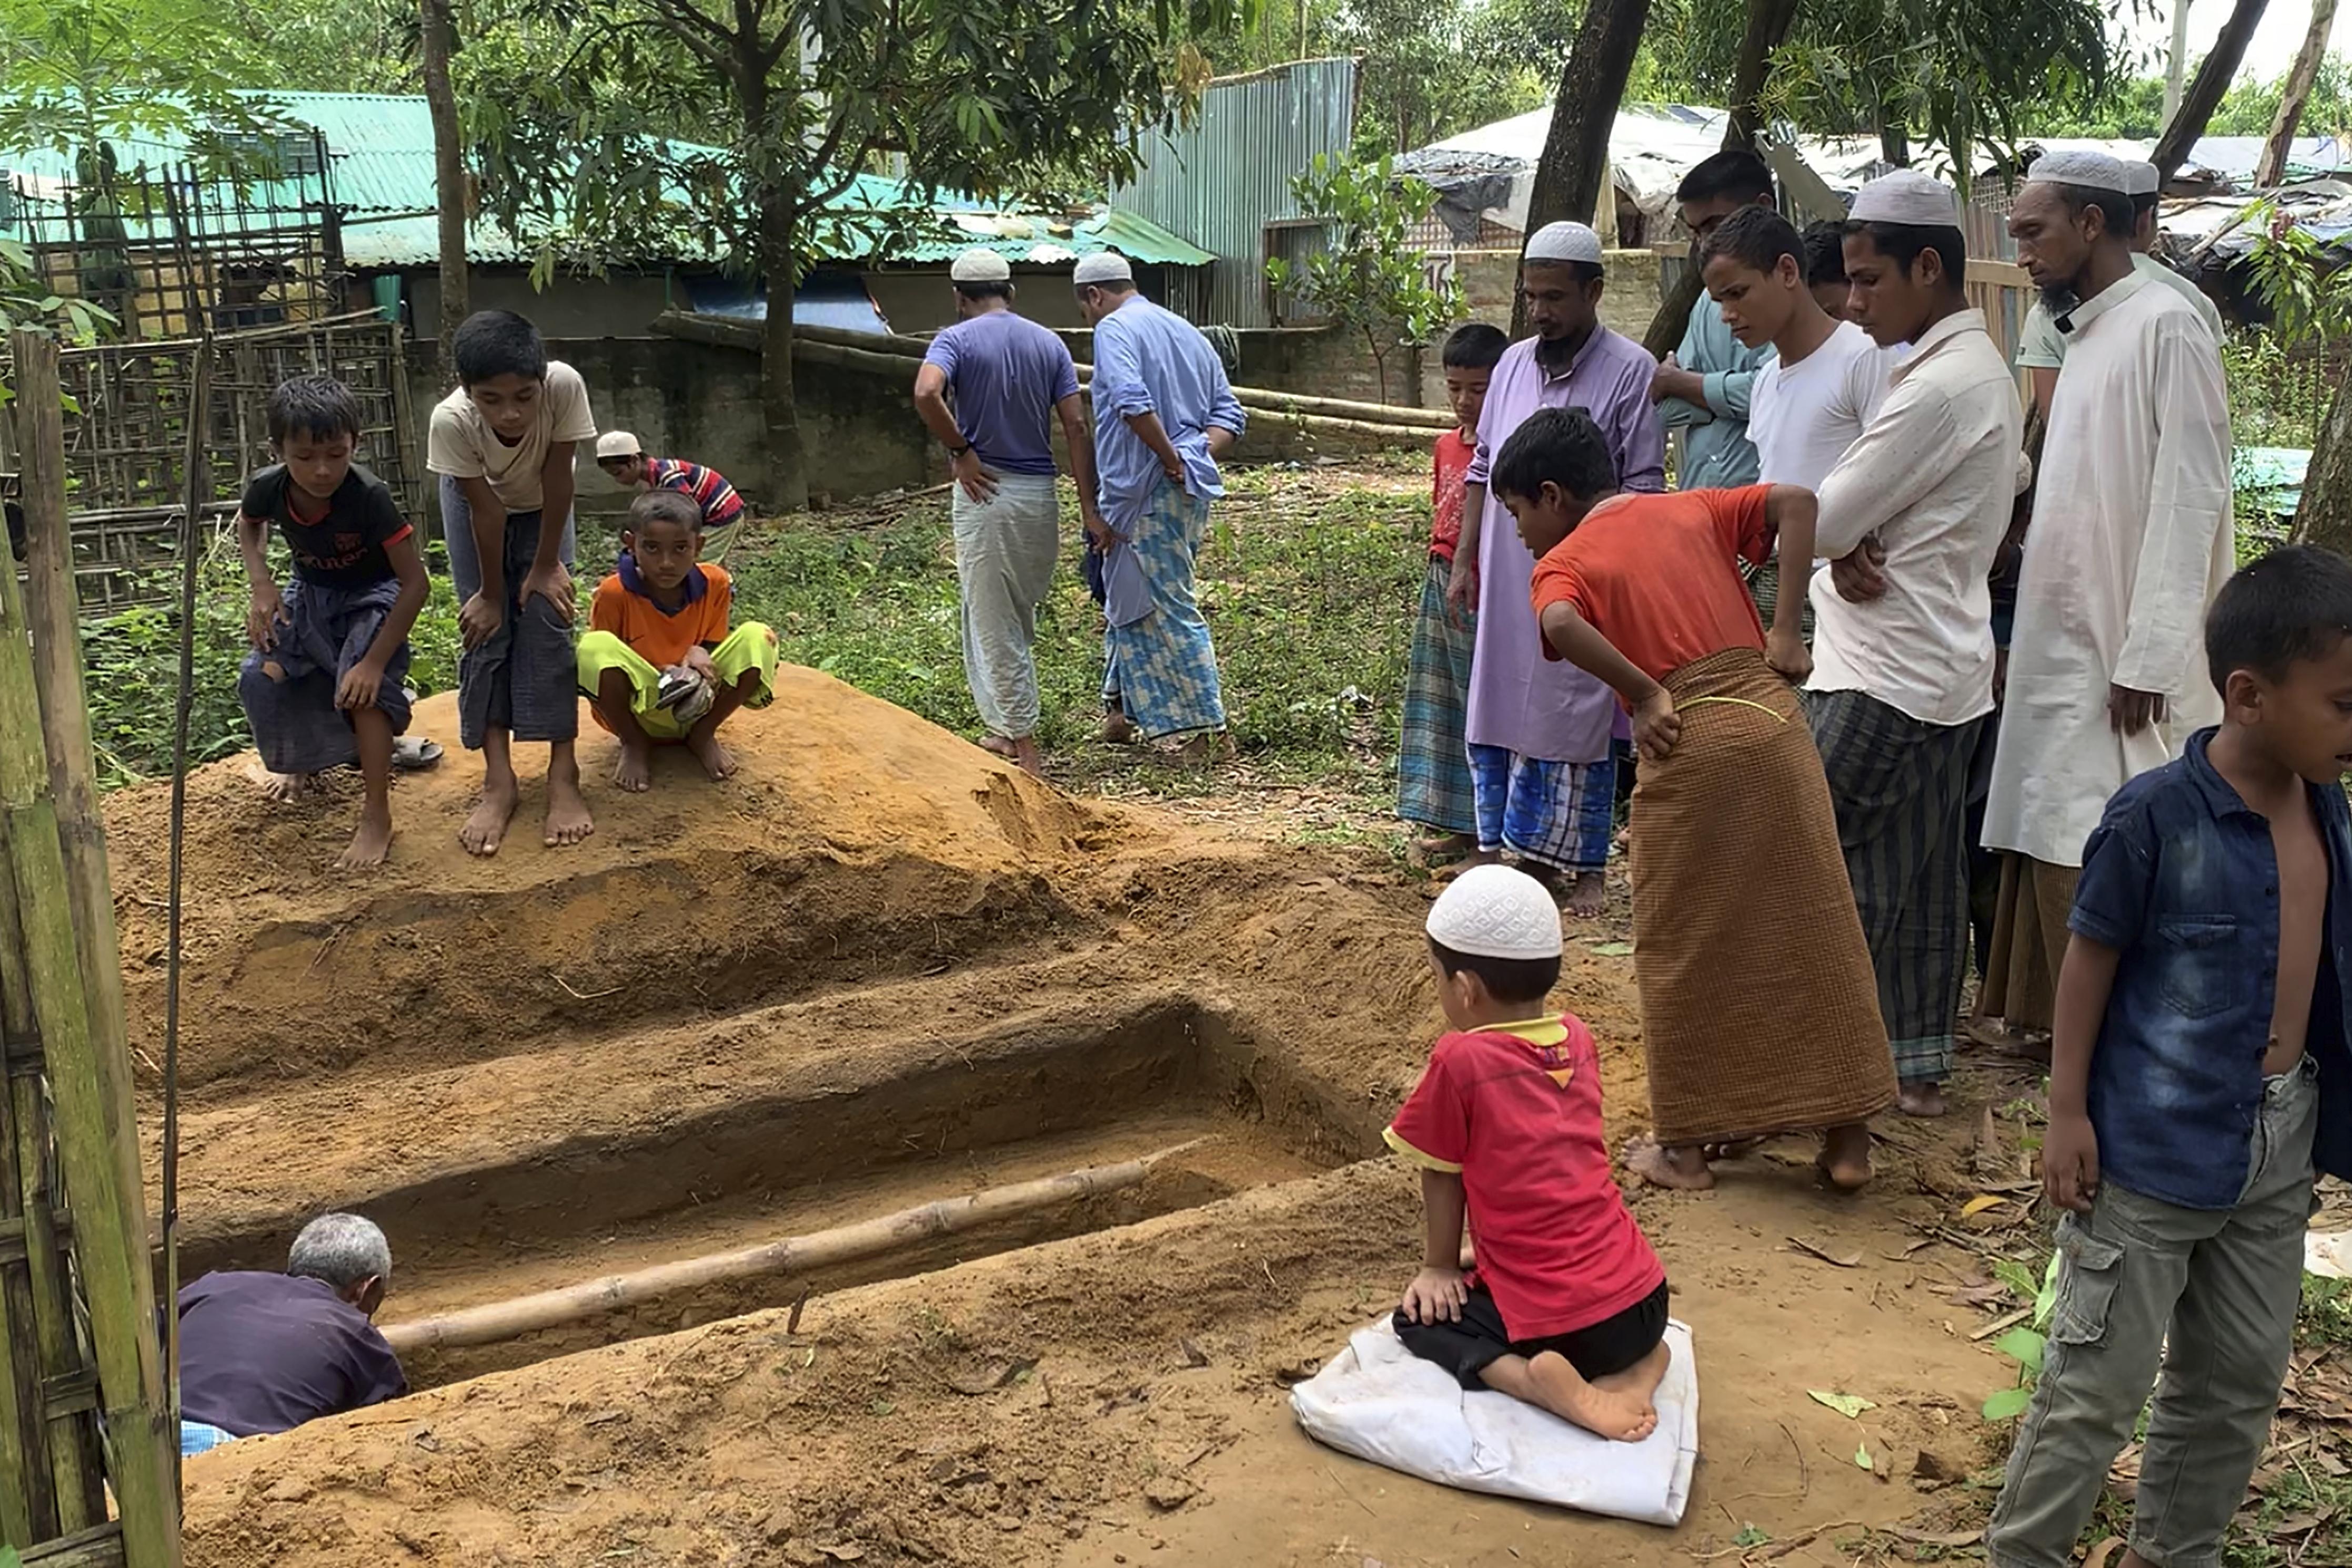 A grave for Mohib Ullah at the Rohingya refugee camp in Kutupalong, Bangladesh